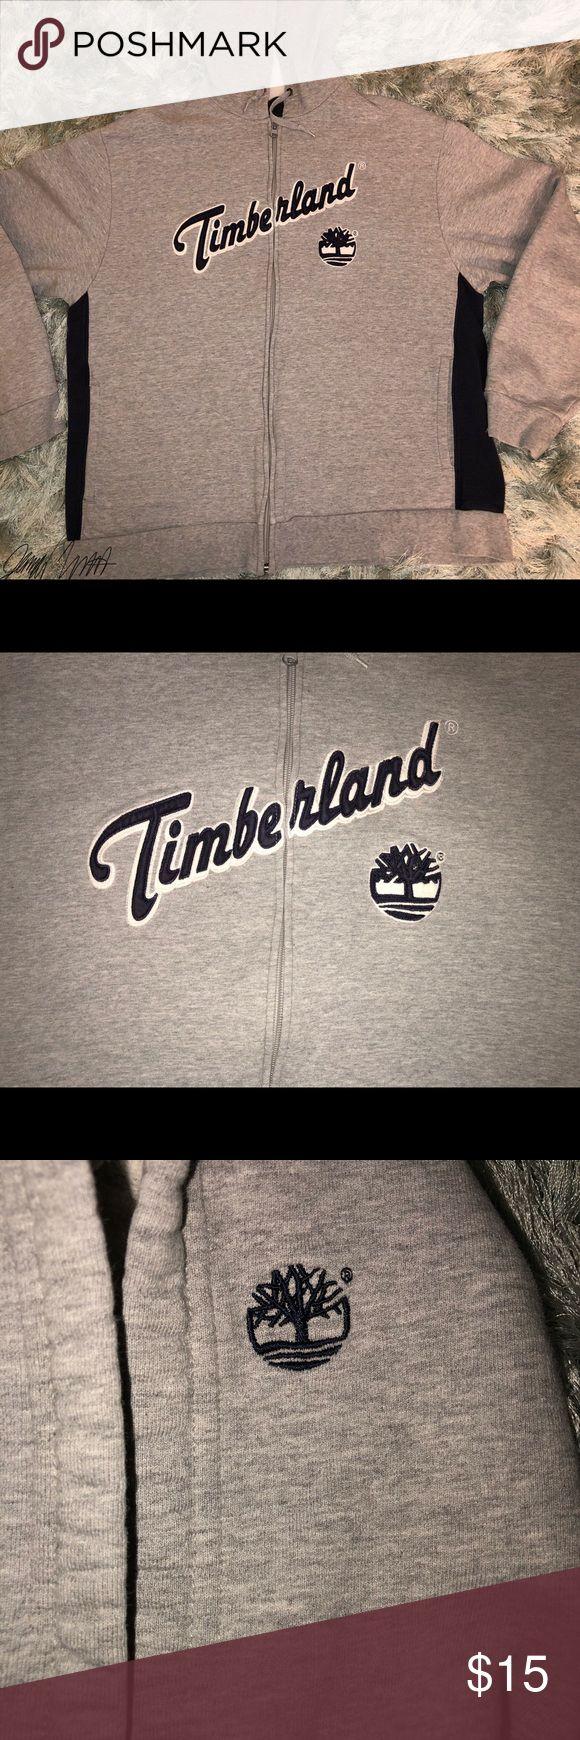 Grey Timberland Zip Up Sweatshirt Large Timberland Grey Blue and White Zip Up Hoodie  (GREAT CONDITION) Timberland Tops Sweatshirts & Hoodies